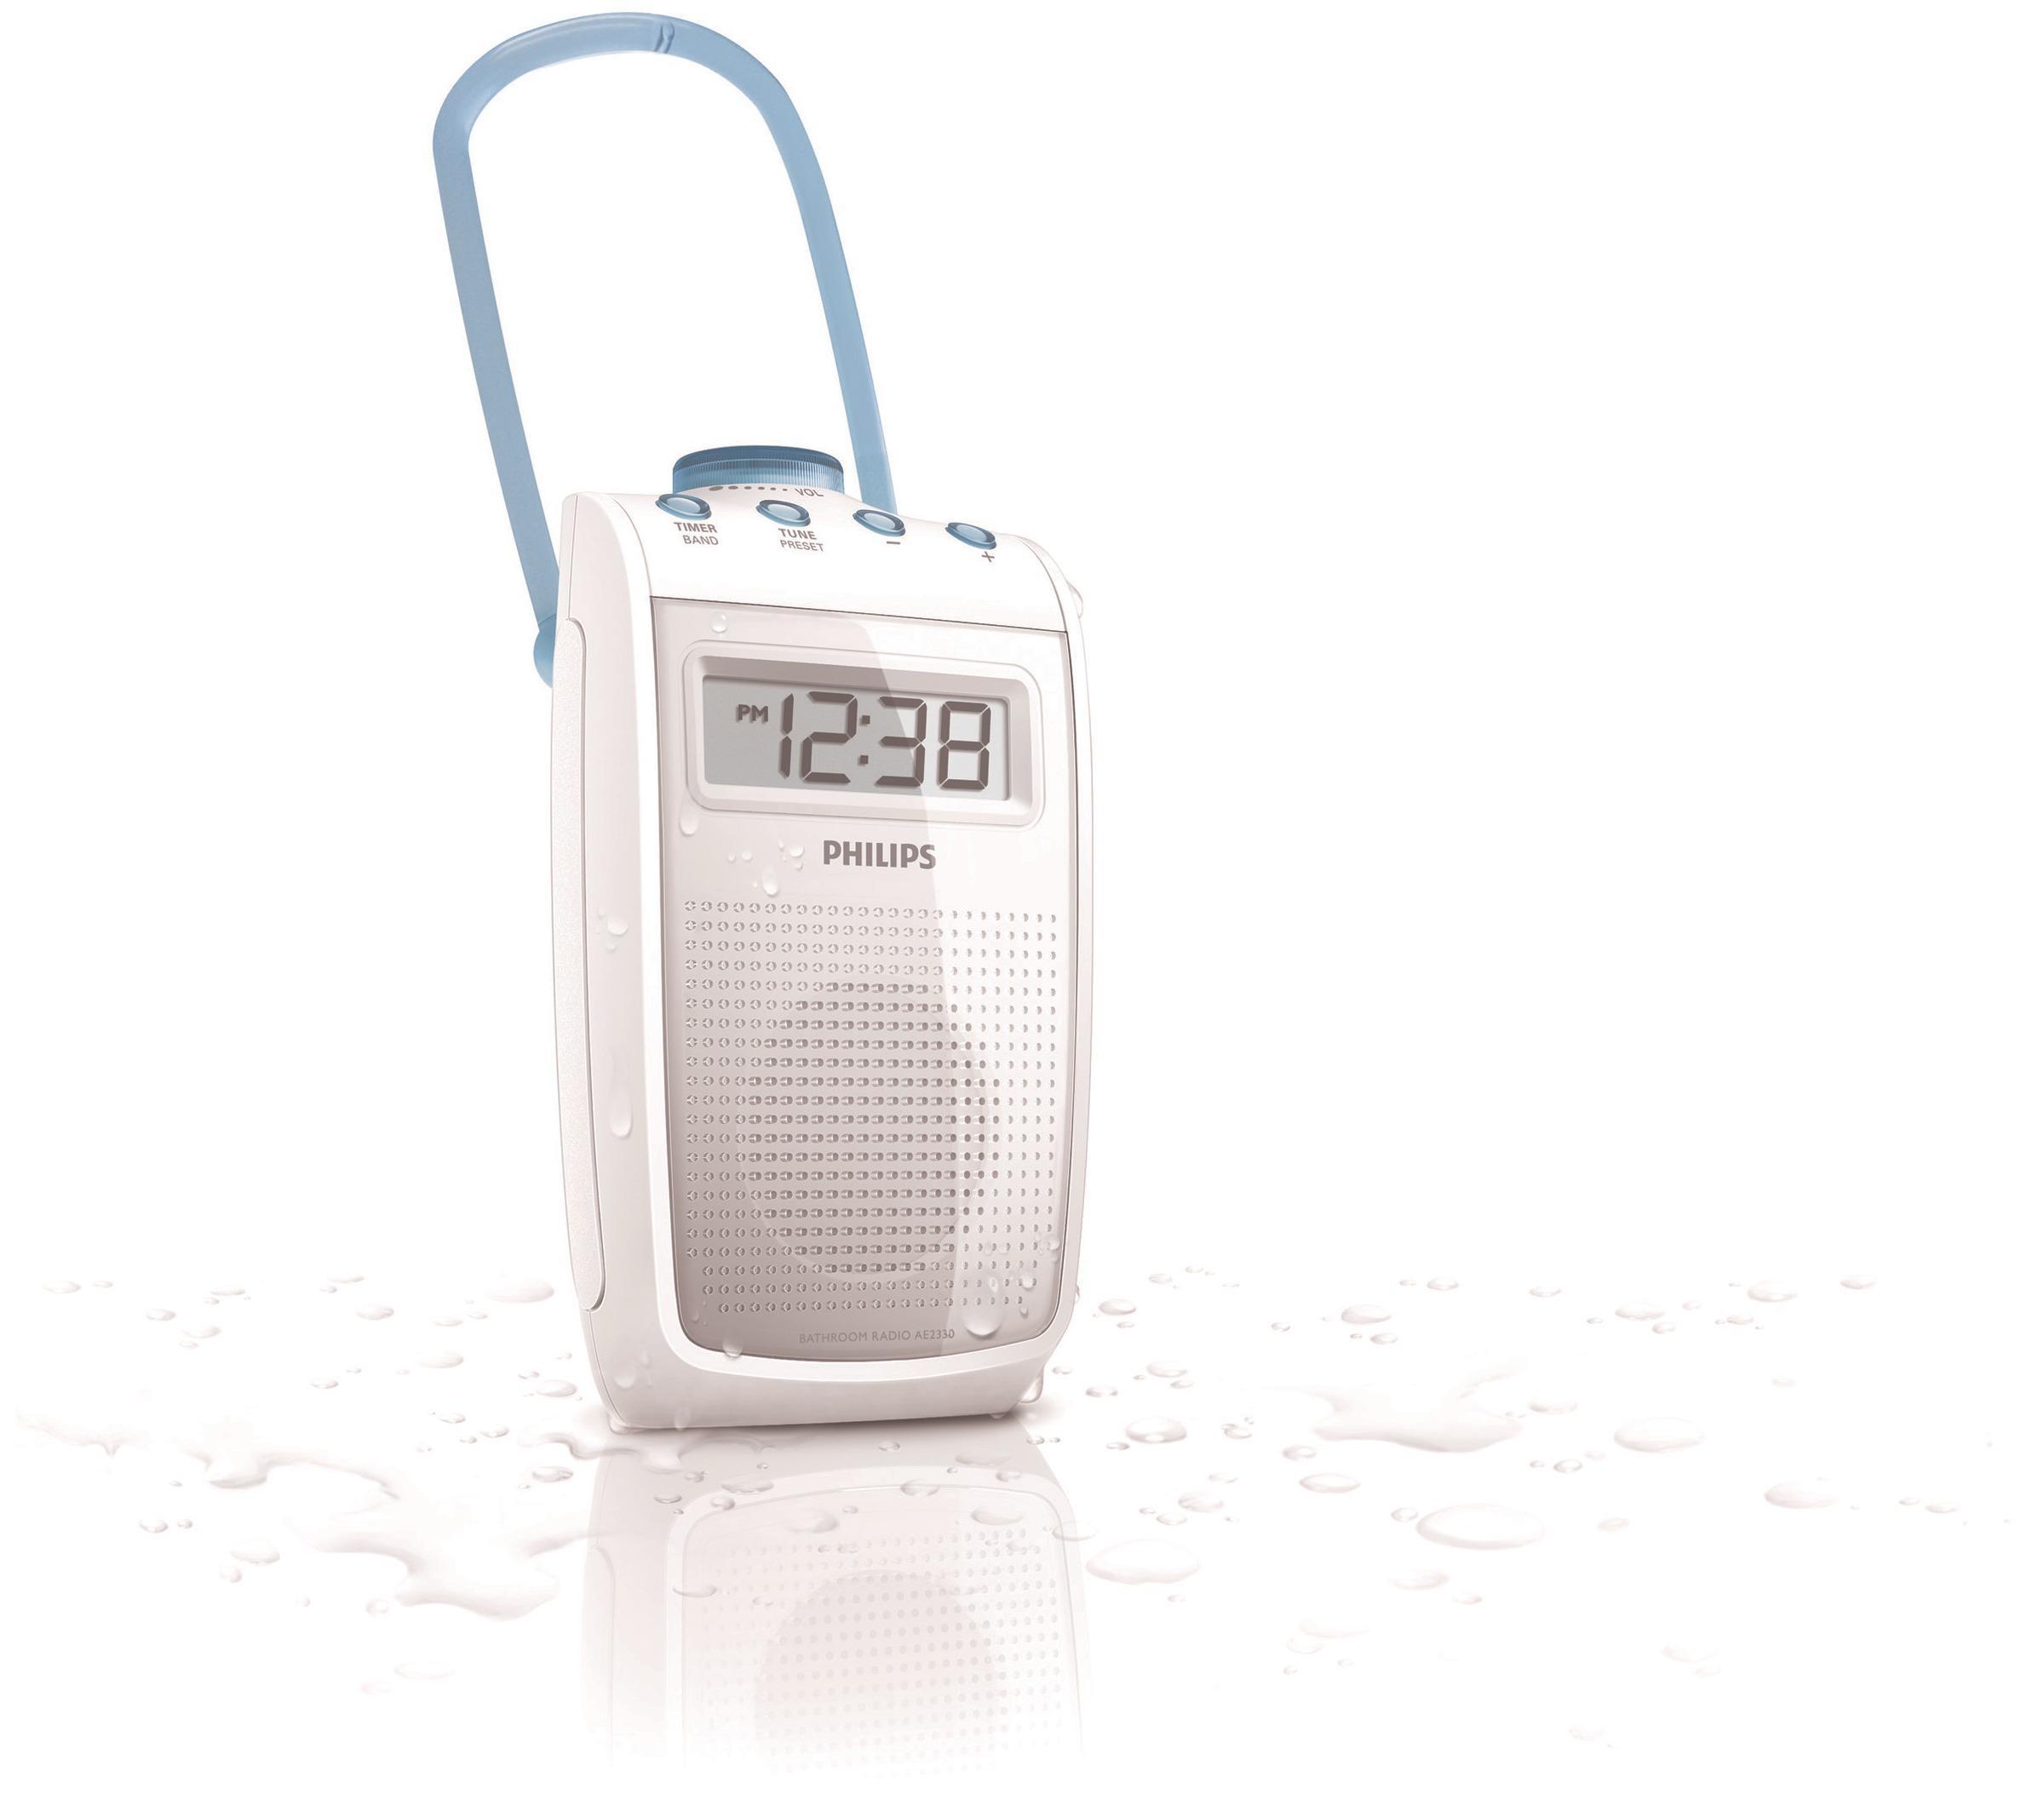 Philips AE9 Tragbares Duschradio (UKW-/MW-Tuner, LC-Display) weiß